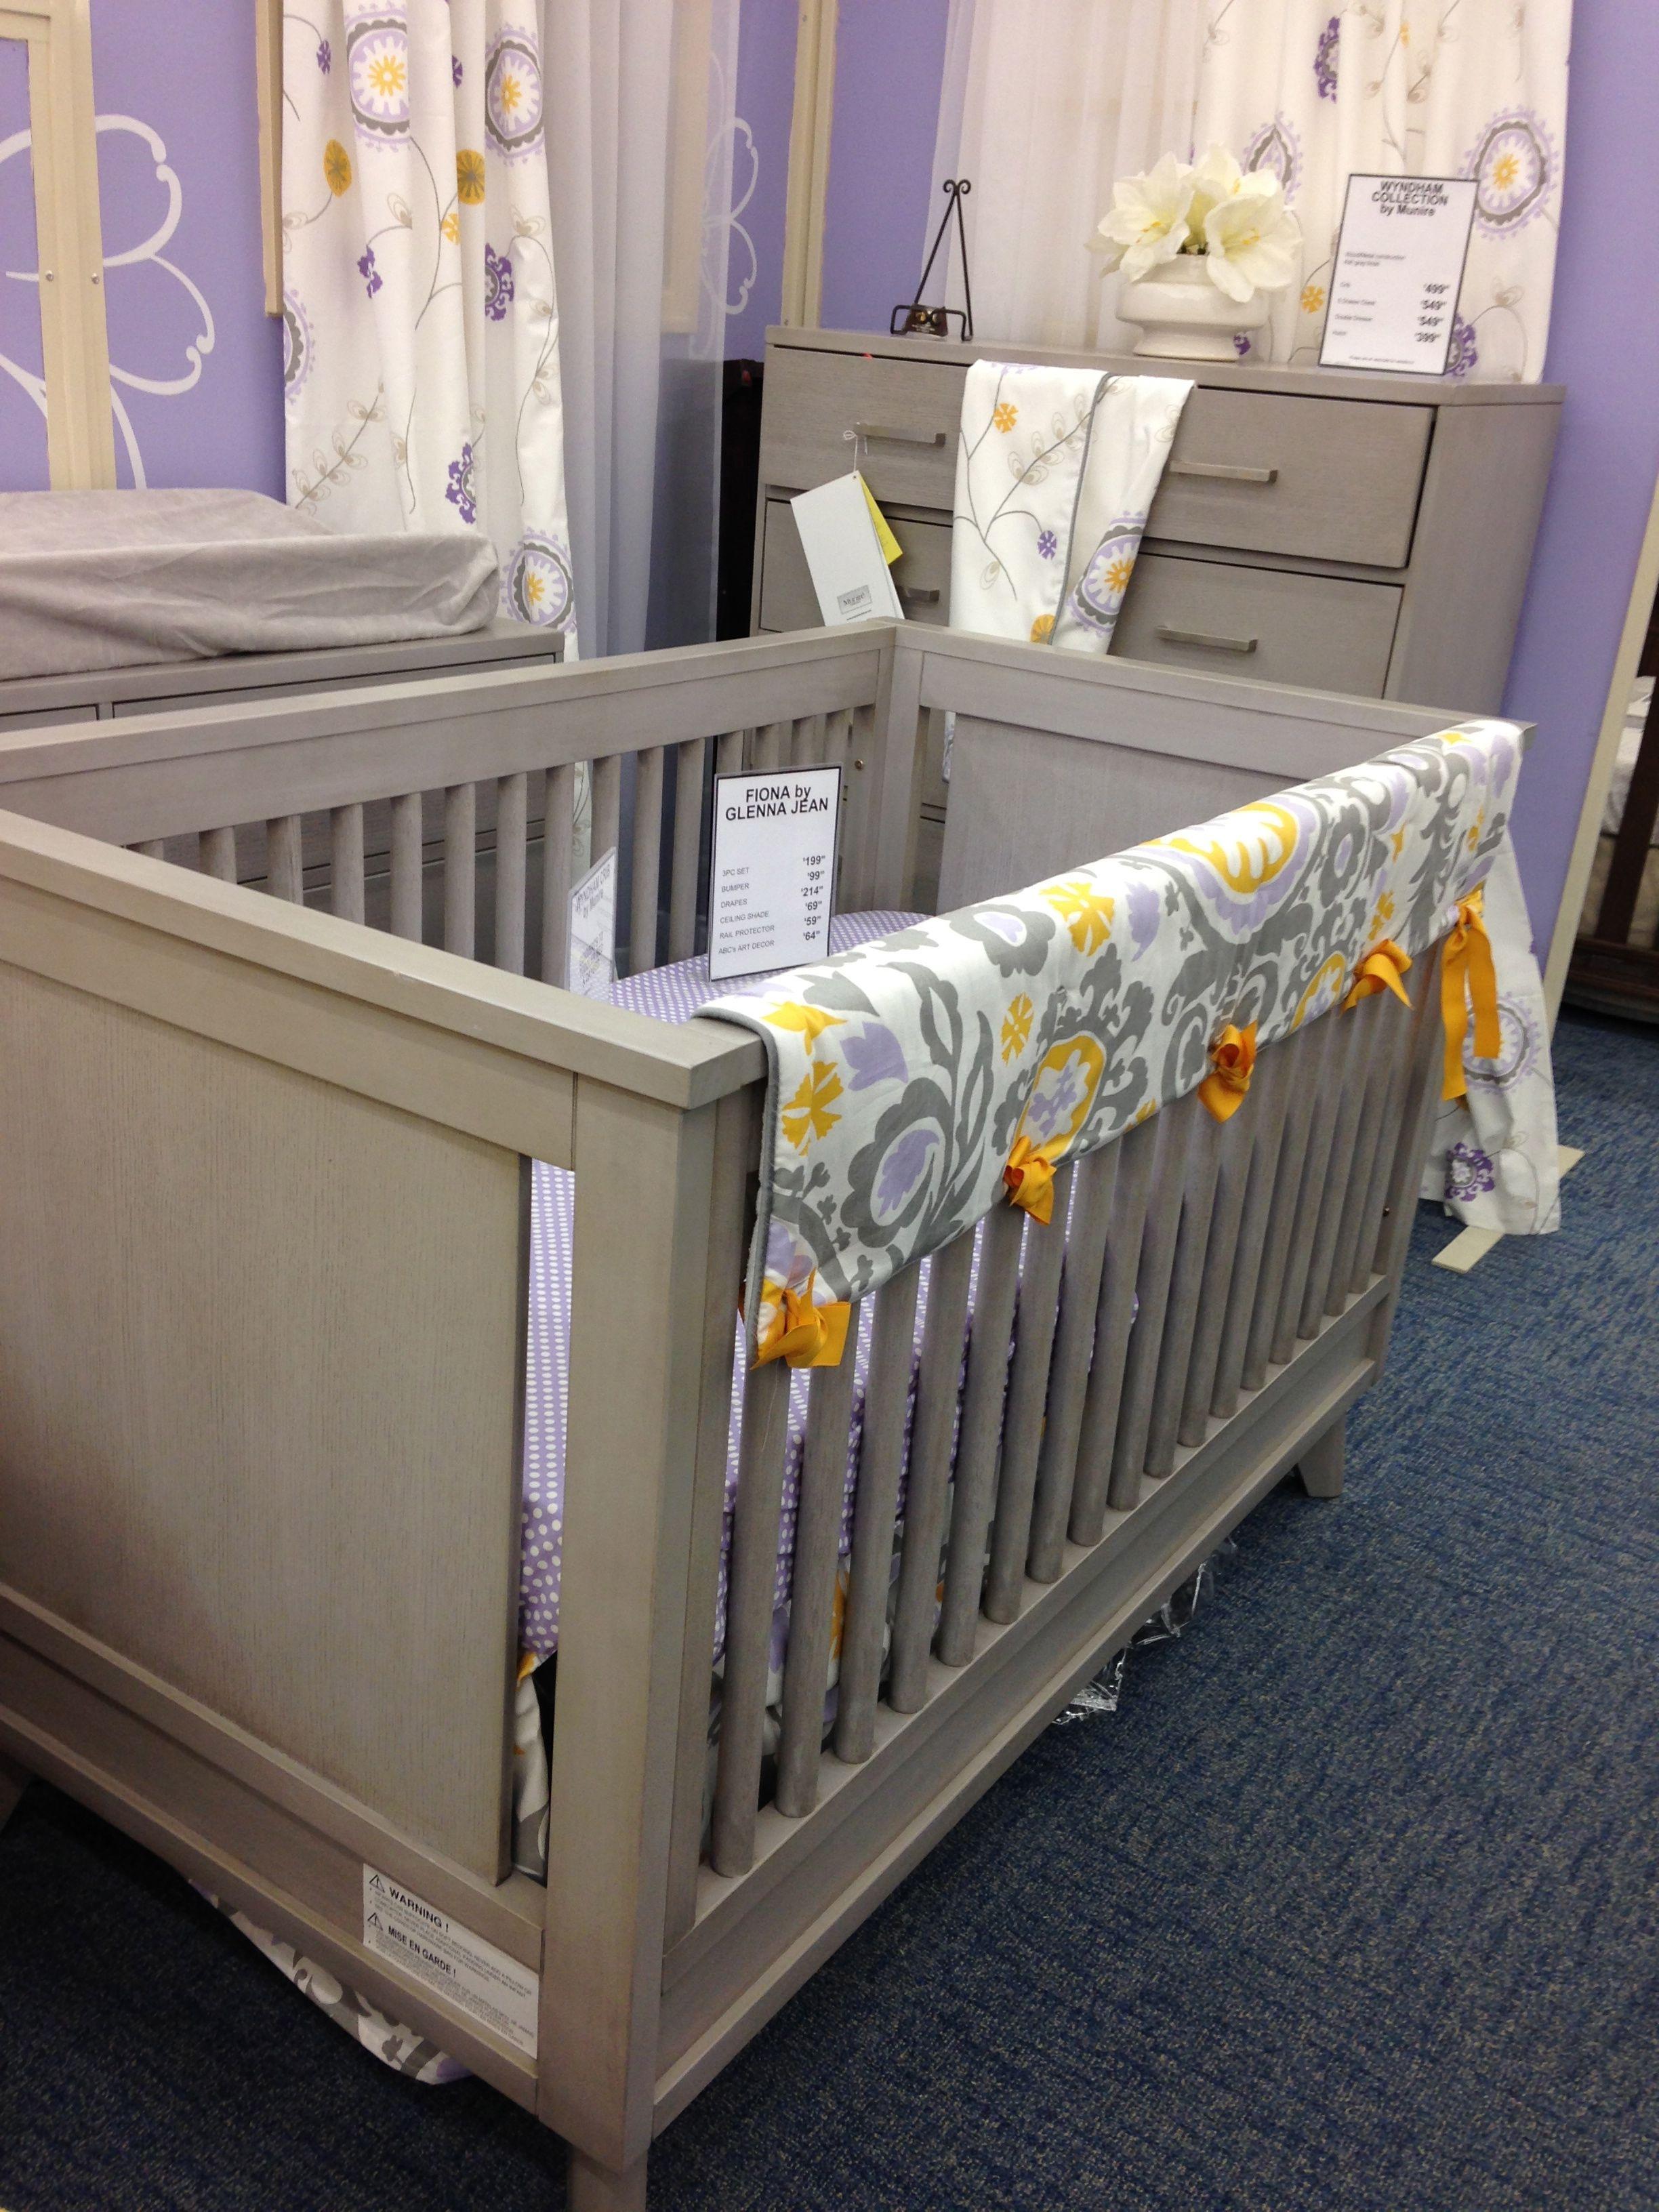 Baby cribs buy buy baby - Munire Wyndham Nursery Furniture